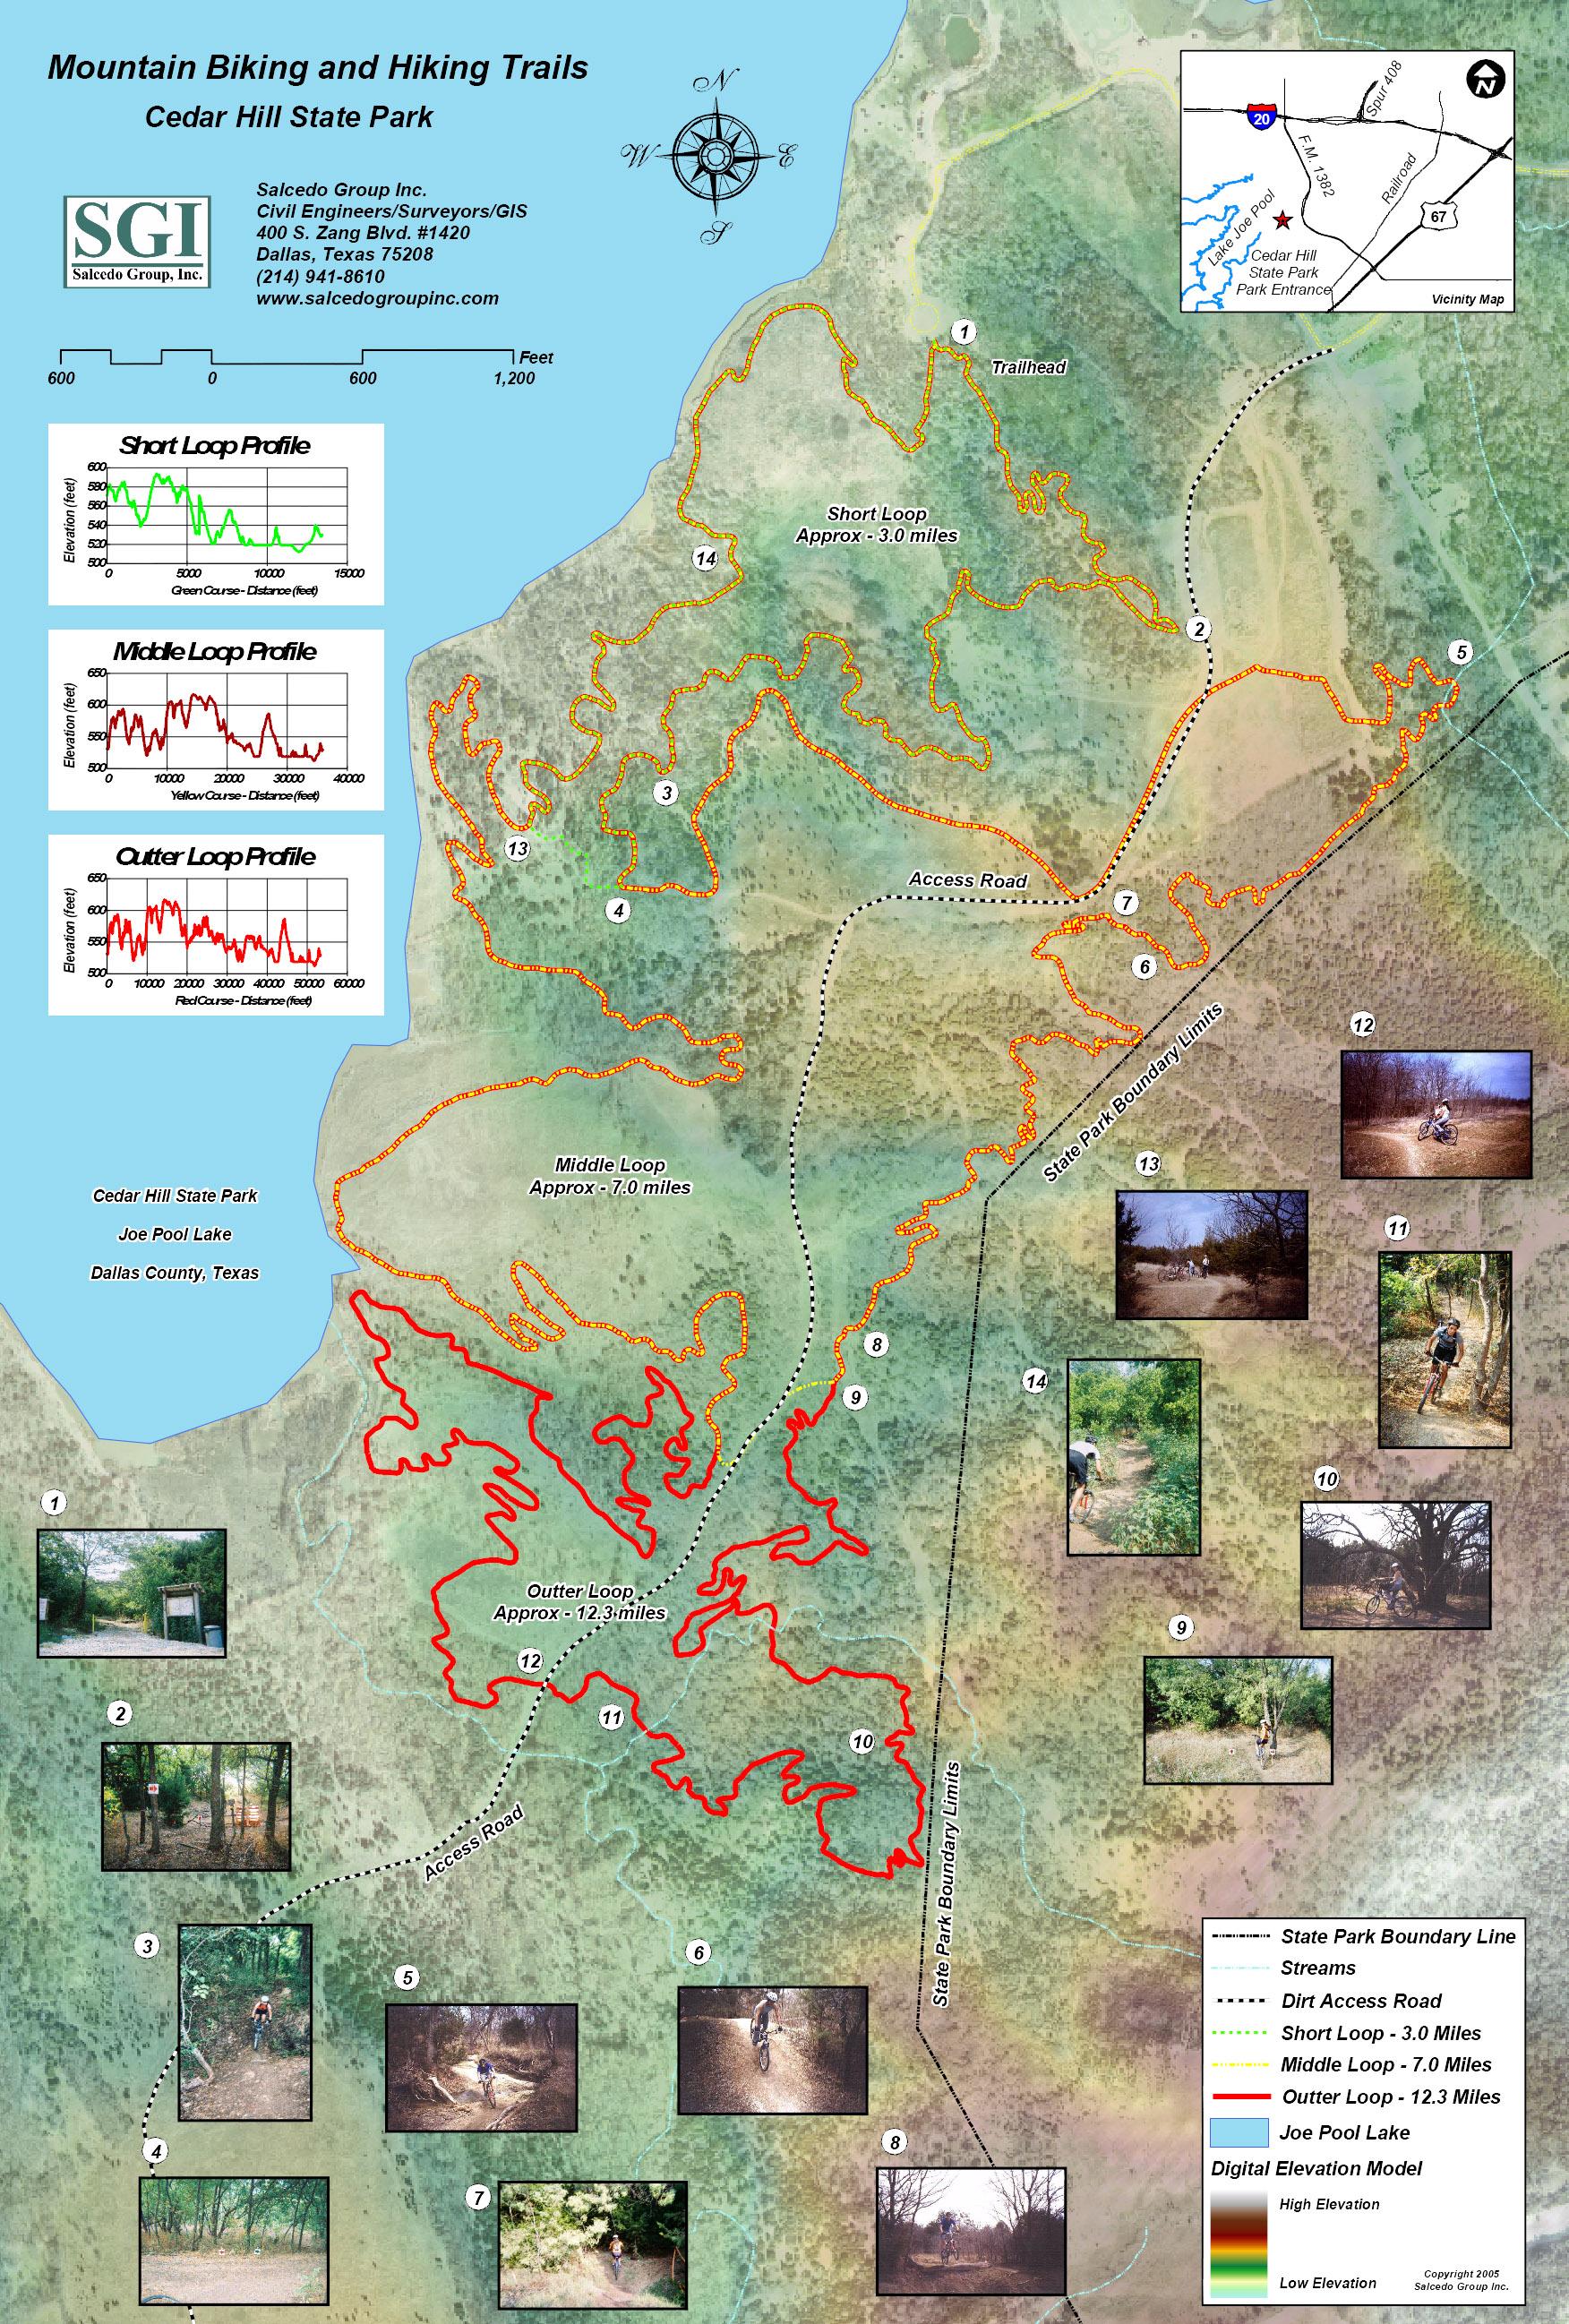 Cedar Hill State Park Mountain Biking And Hiking Map